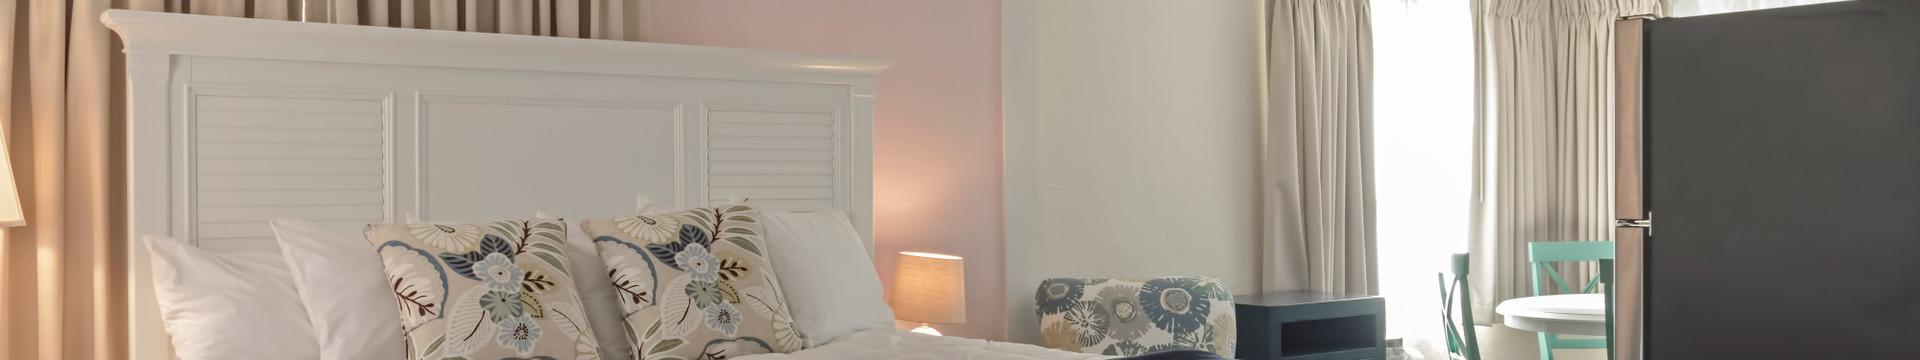 Bedroom in the Seashell Suite - Sea View Inn